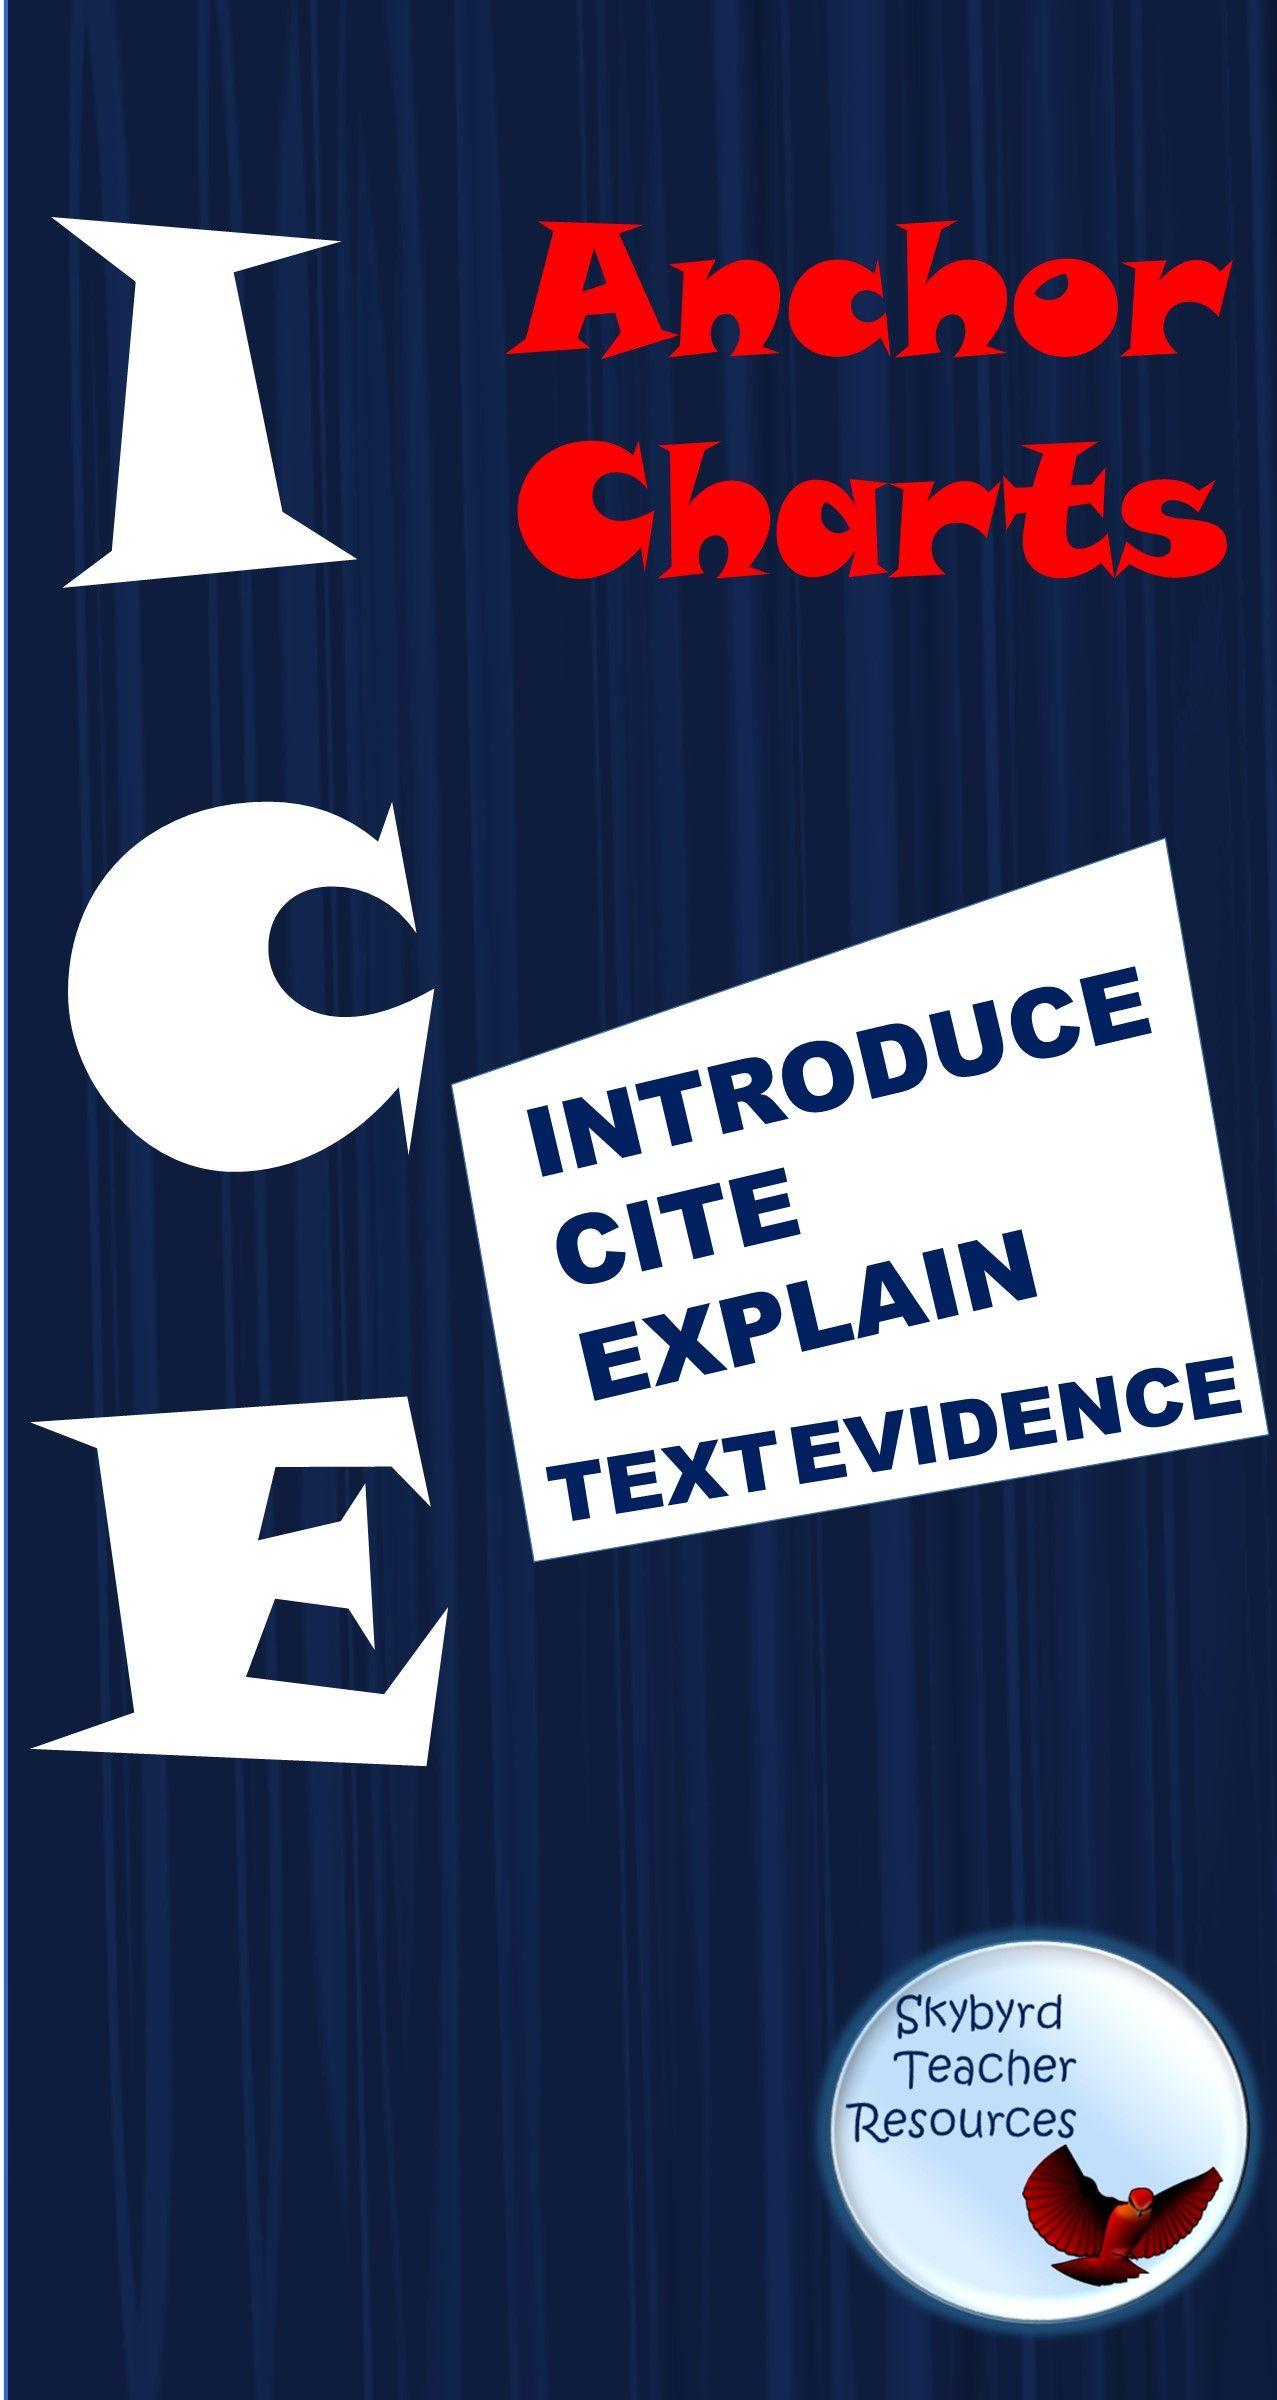 Ice Introduce Cite Explain Textual Evidence Anchor Charts